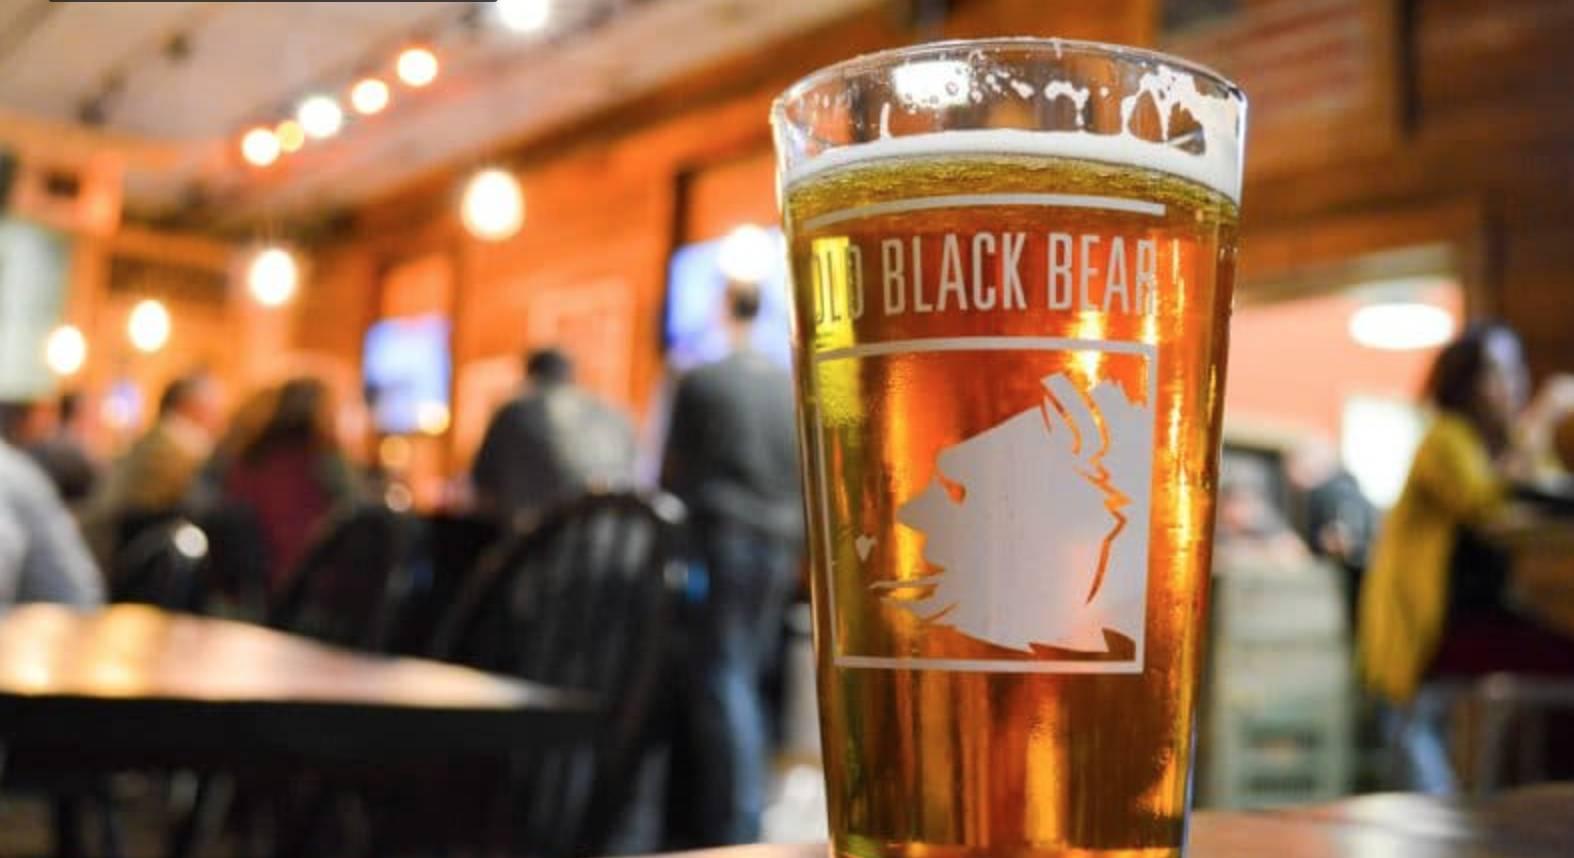 Old Black Bear Brewing Company